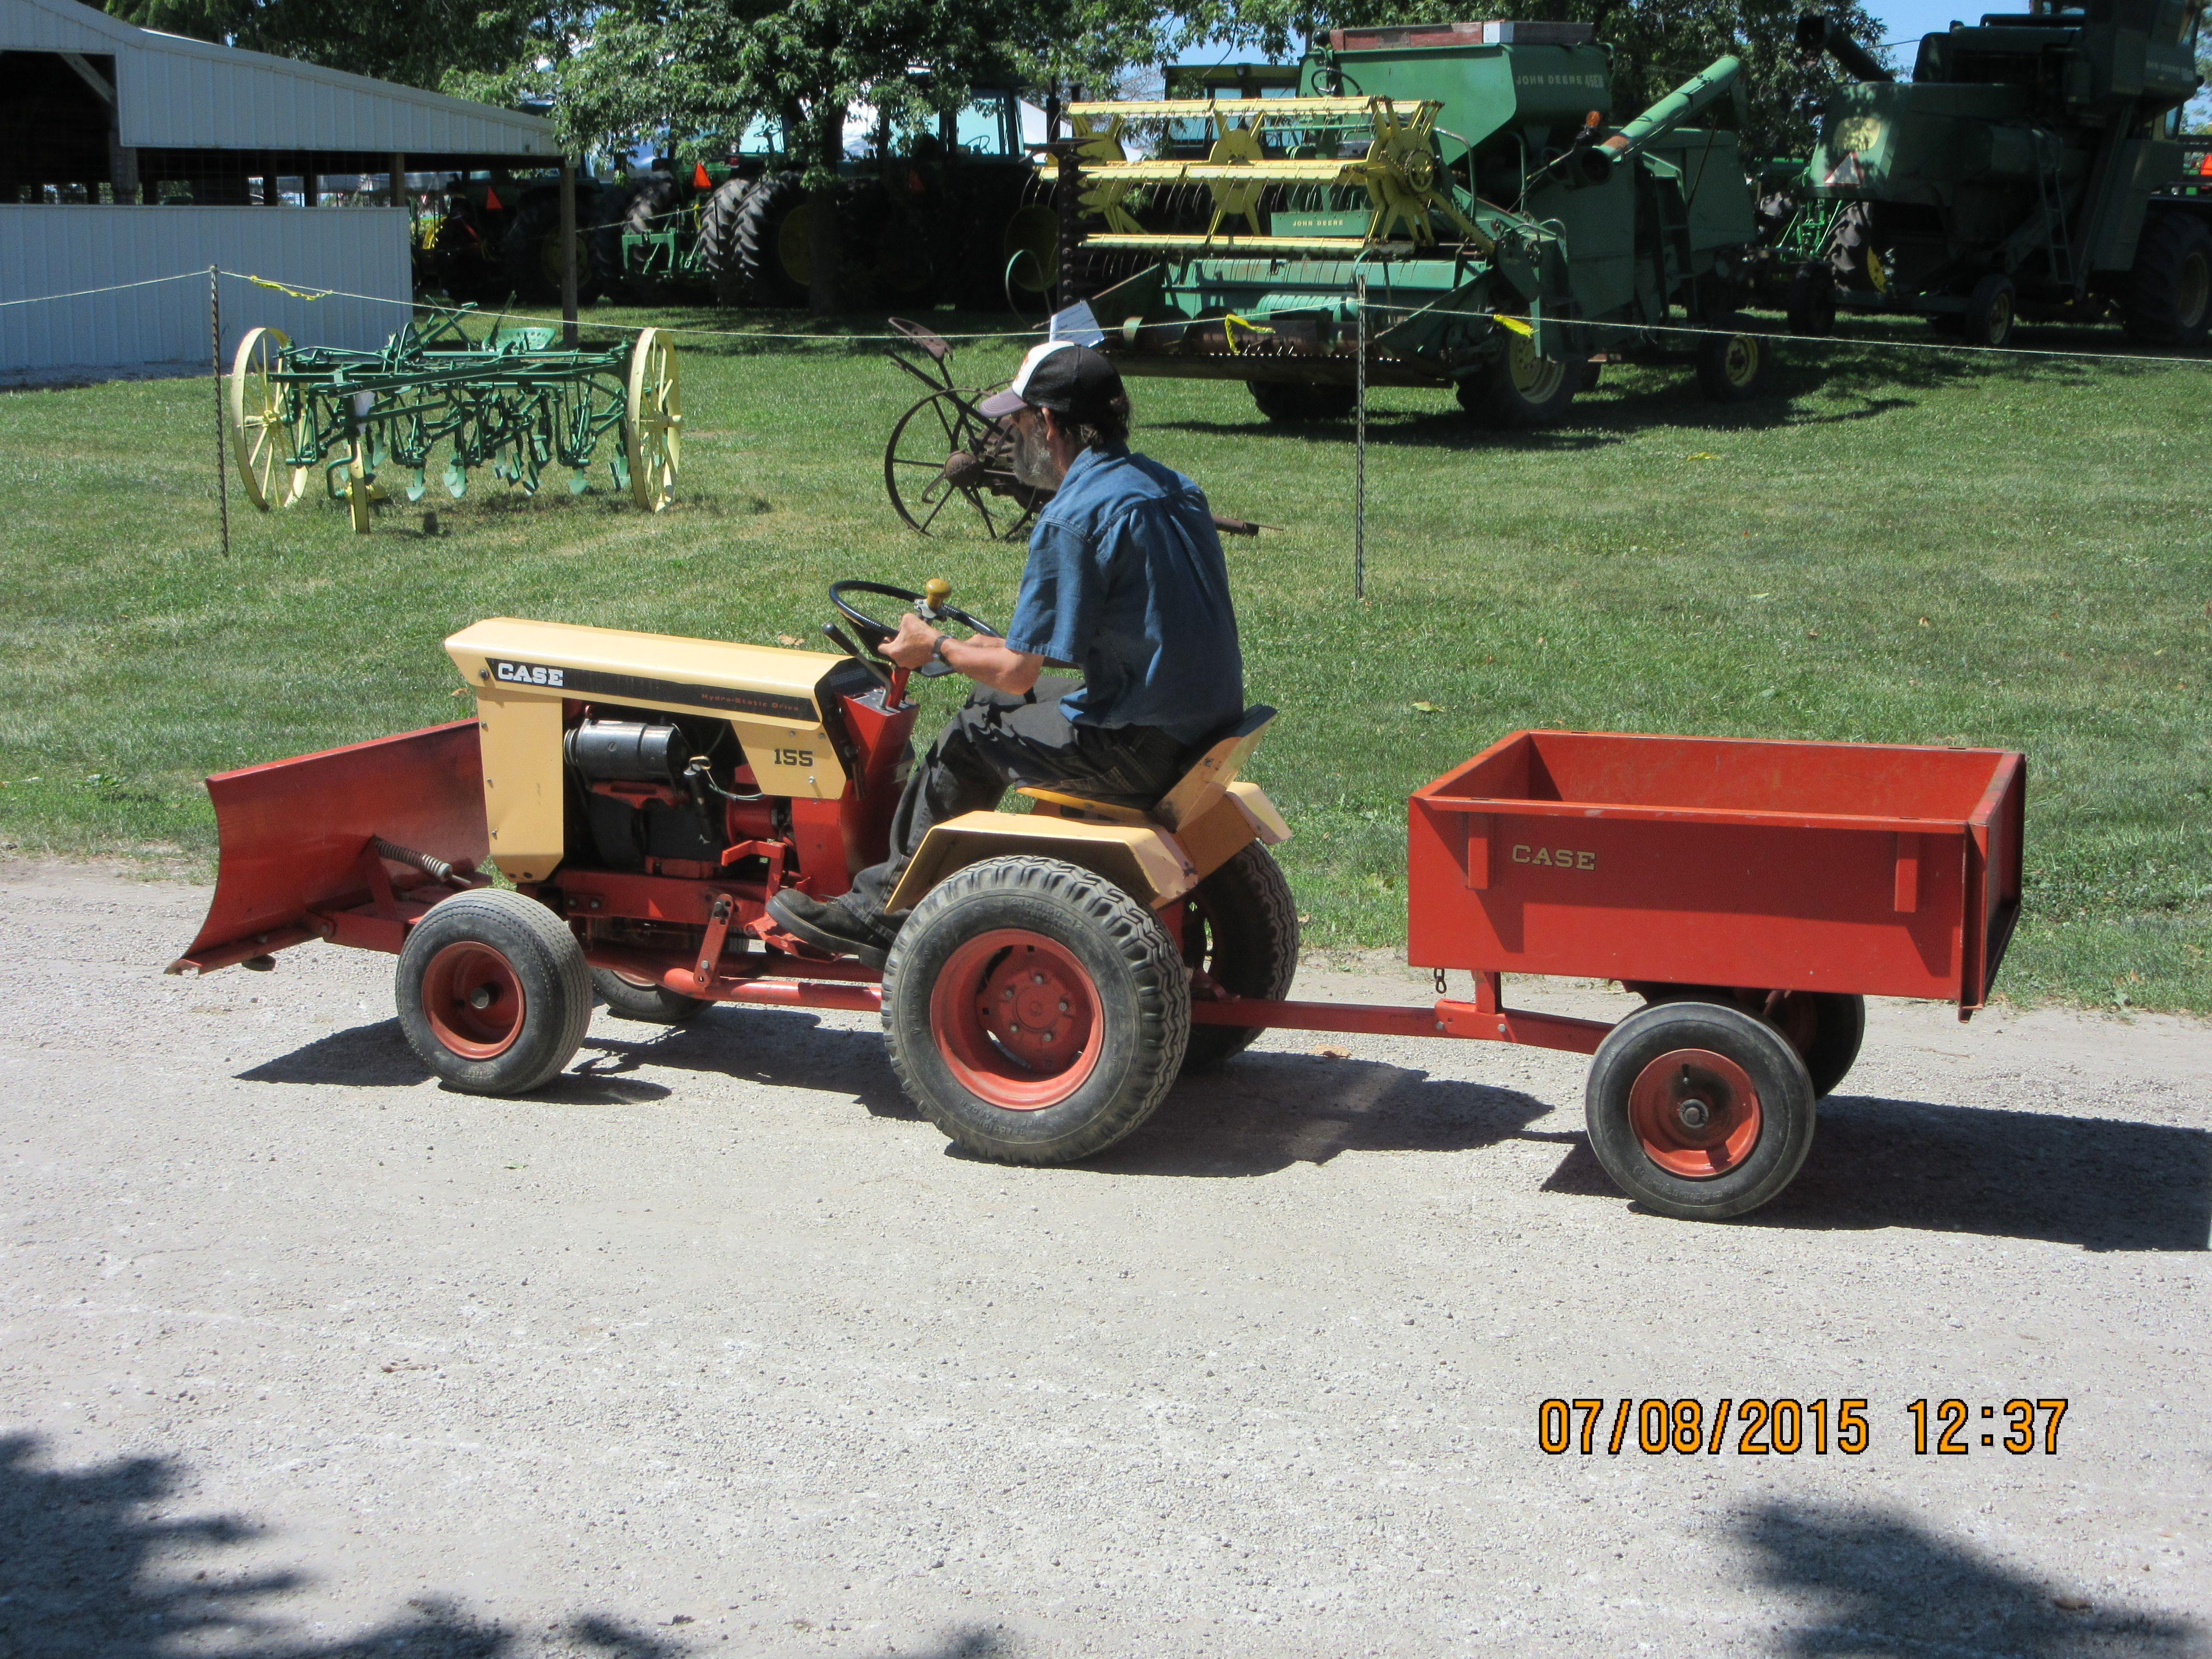 case 155 lawn garden tractor towing orange wagon j i case rh pinterest com Case 224 Garden Tractor Case 446 Garden Tractor